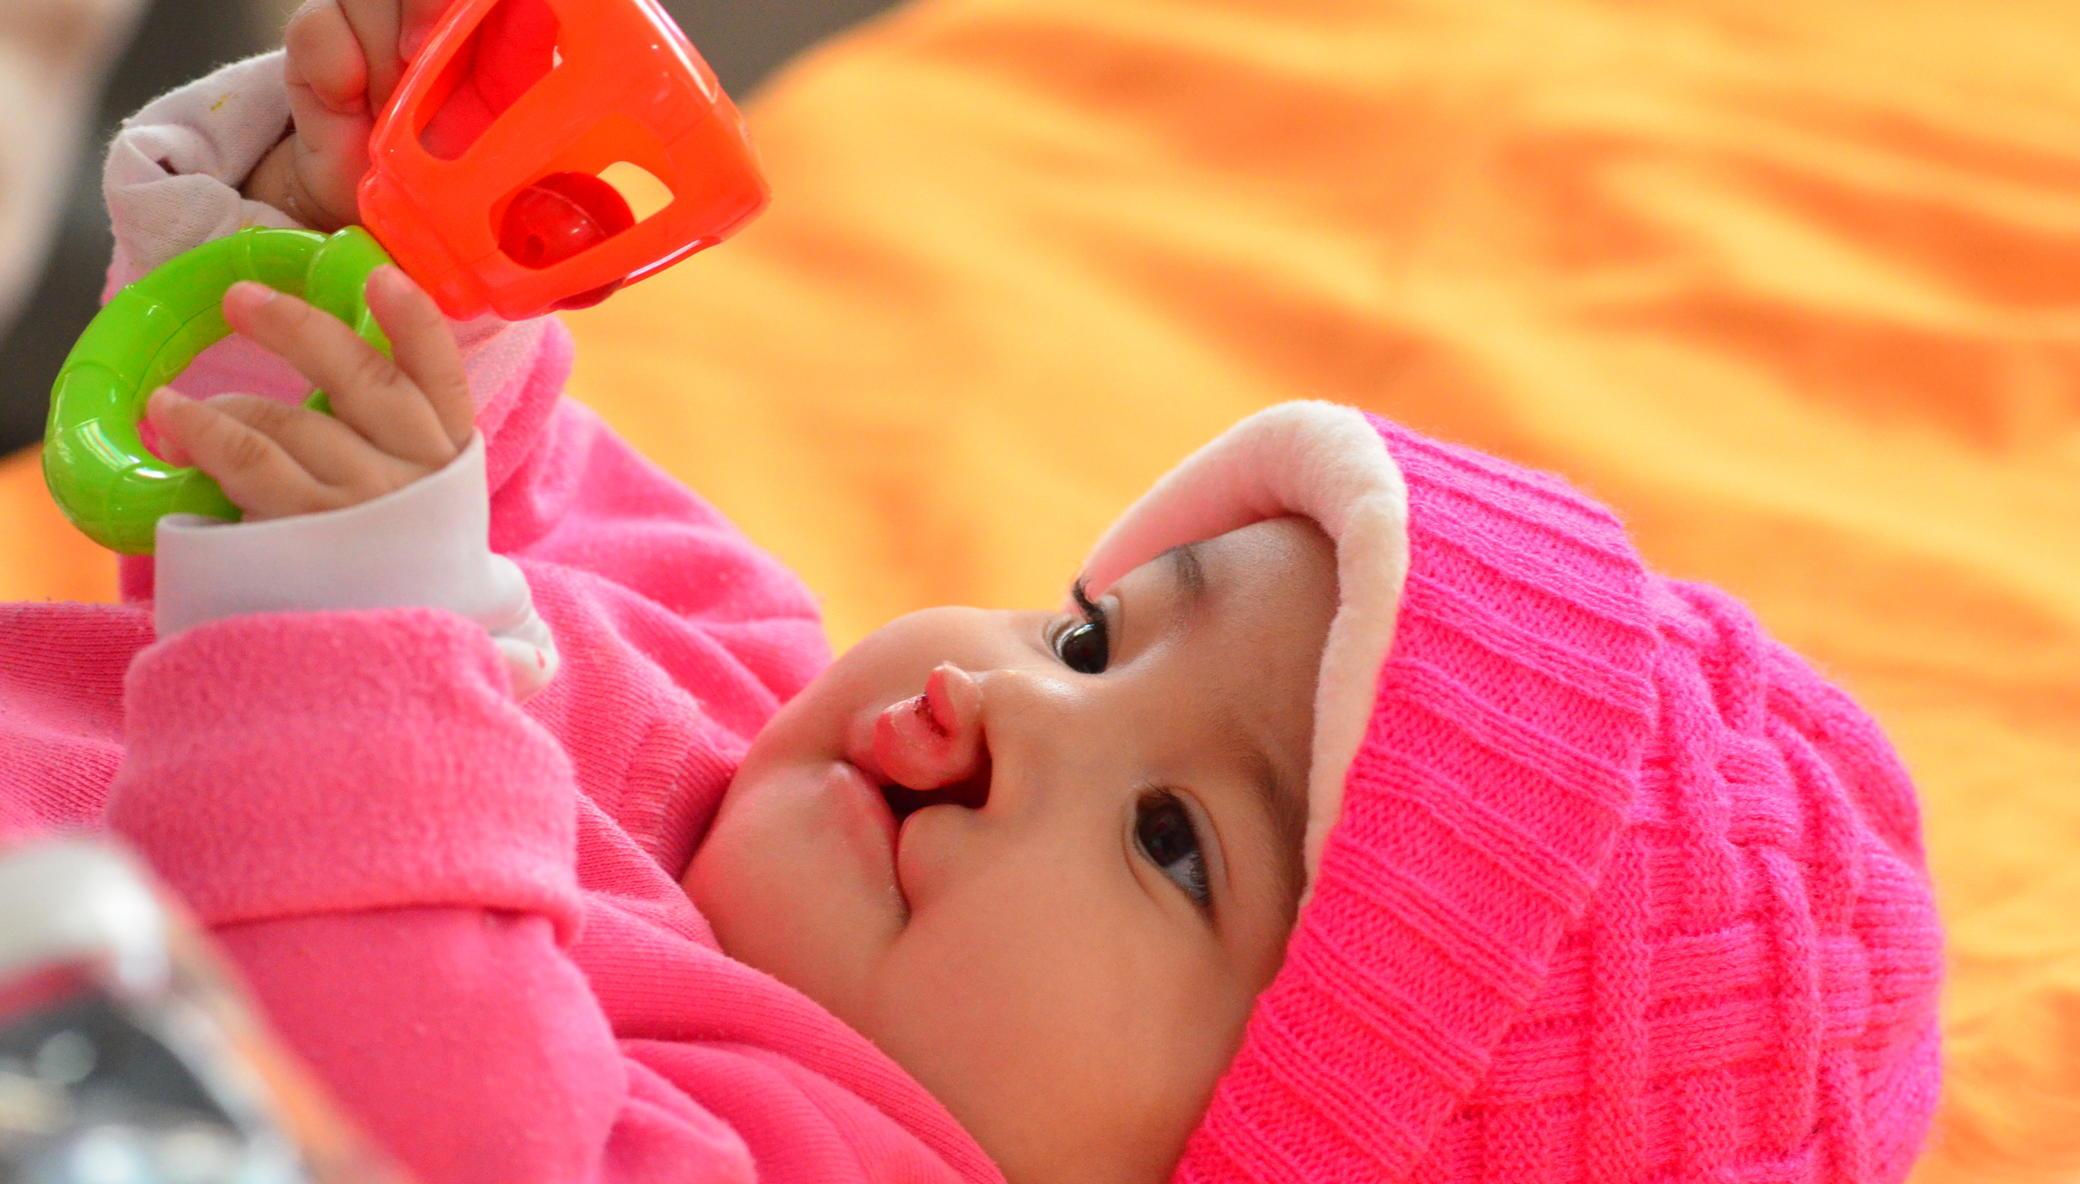 Support Healthy Smiles for Children in Ecuador